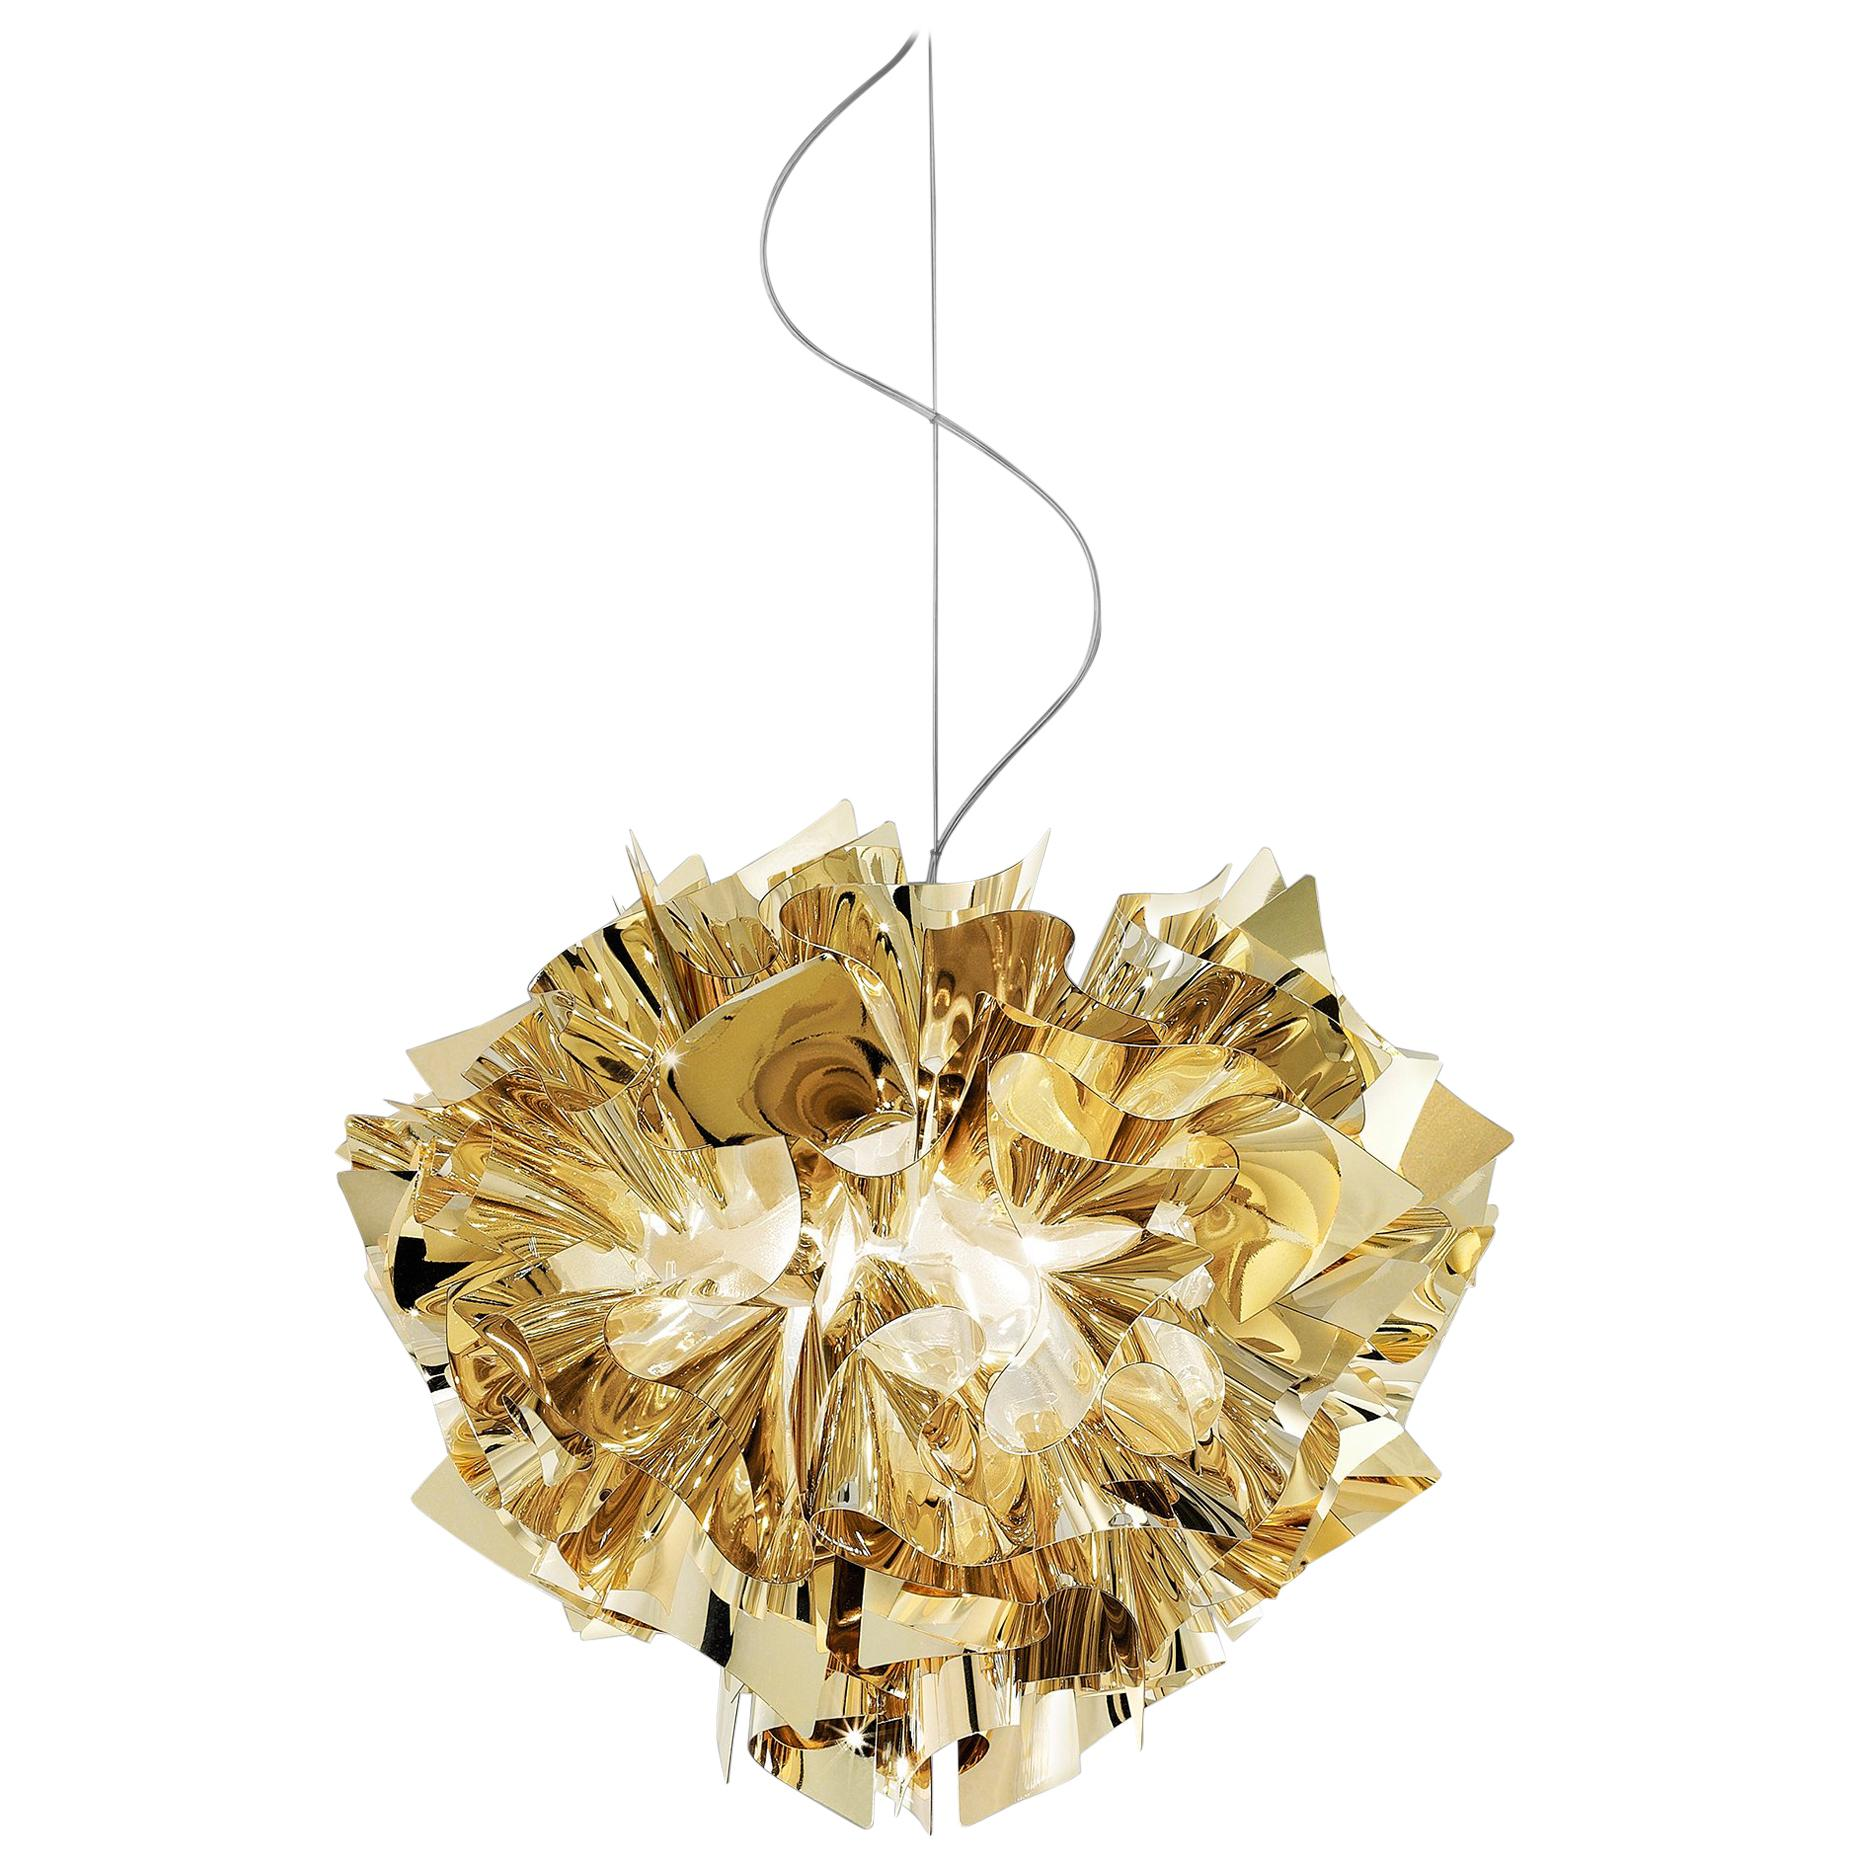 SLAMP Veli Medium Suspension Light in Gold by Adriano Rachele